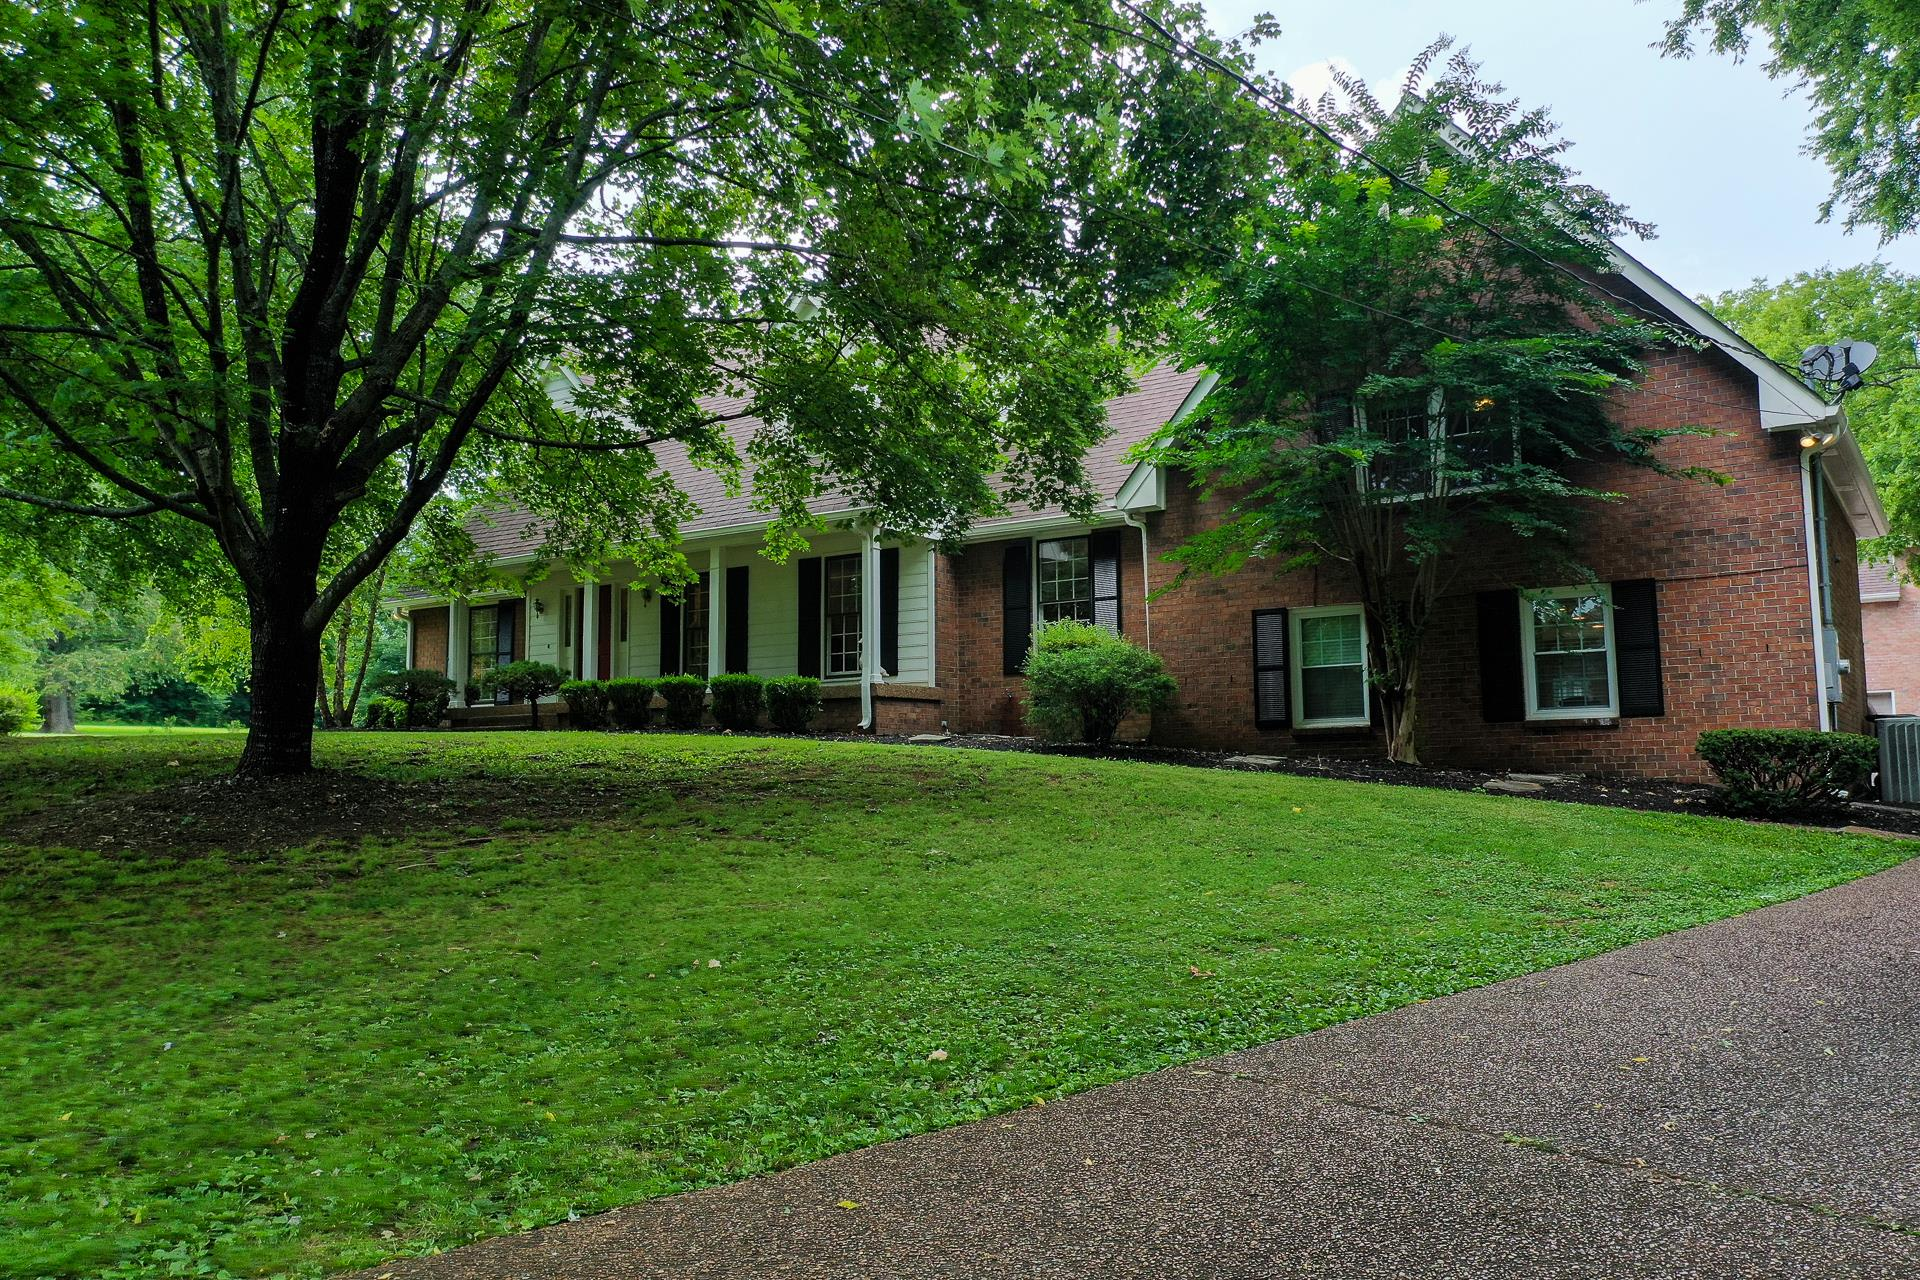 106 Sioux Ct, Hendersonville, TN 37075 - Hendersonville, TN real estate listing